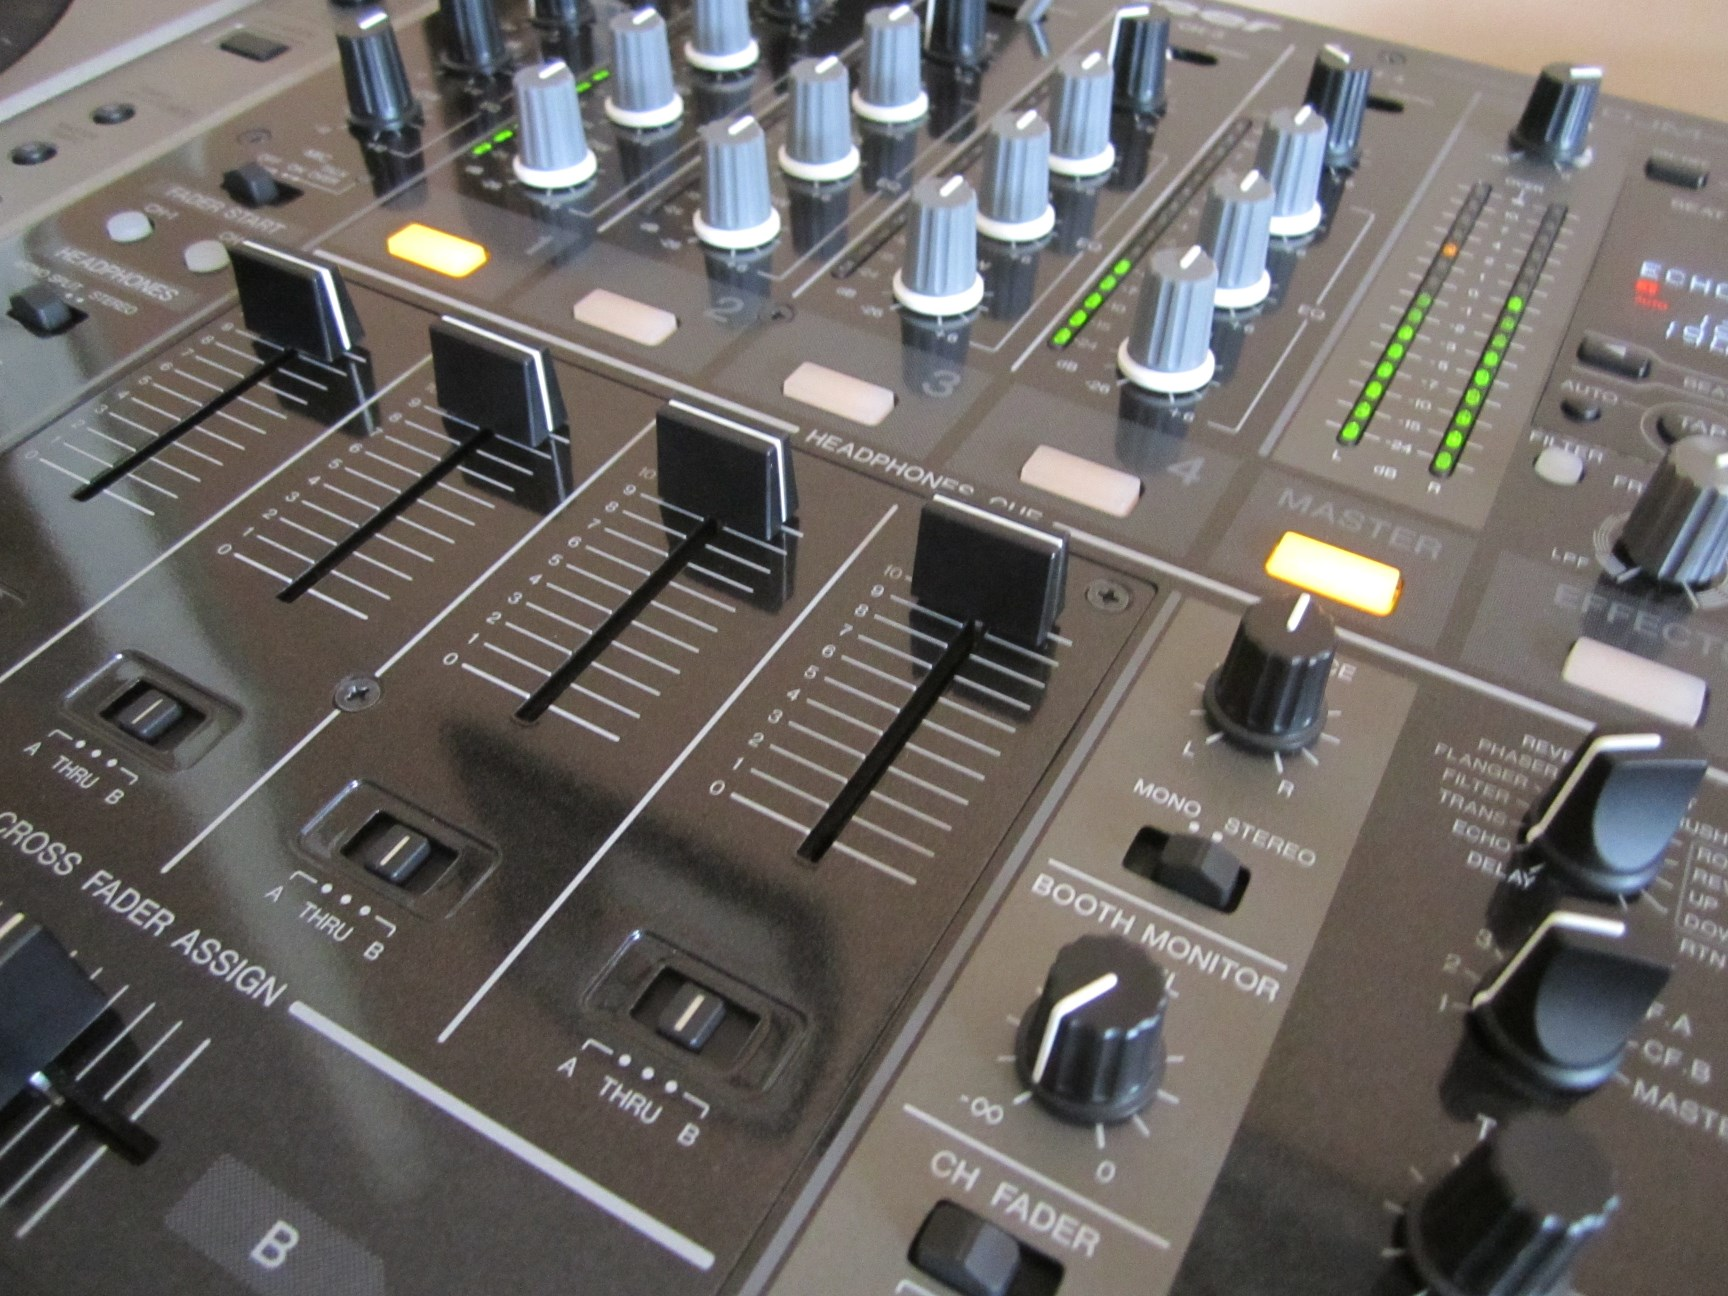 Achat pioneer djm 700 k d 39 occasion audiofanzine - Table de mixage pioneer occasion ...